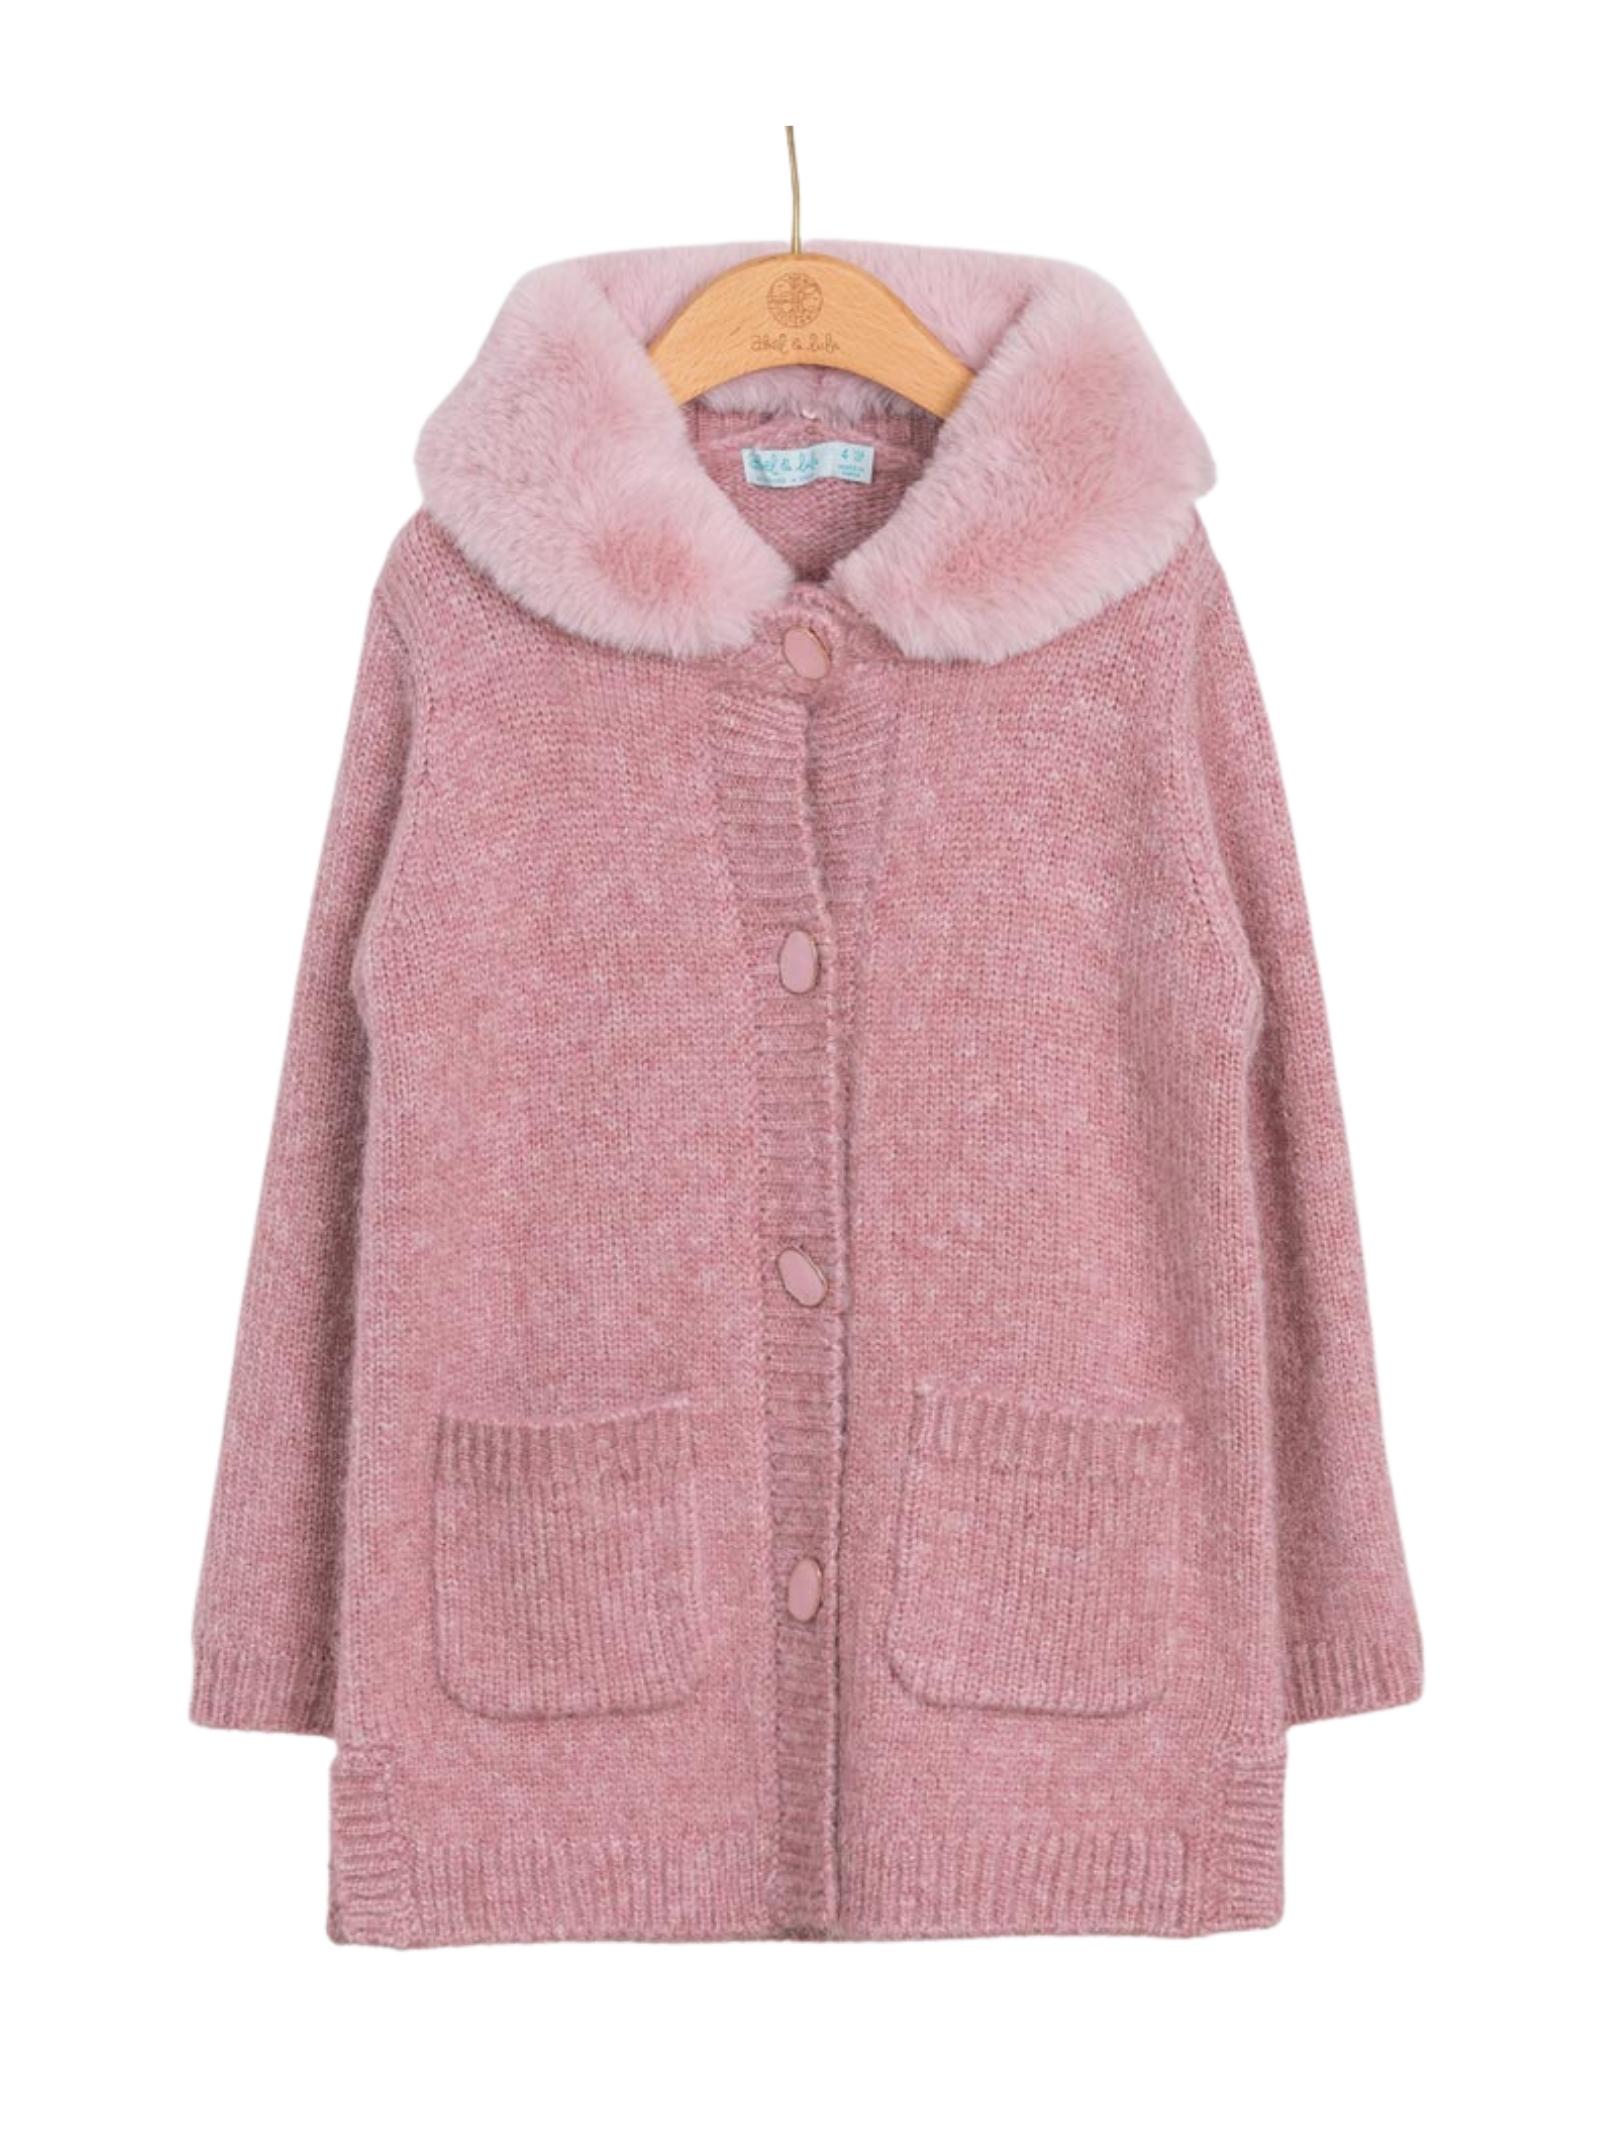 Faux Fur Collar Cardigan ABEL&LULA | Cardigan | 5842080